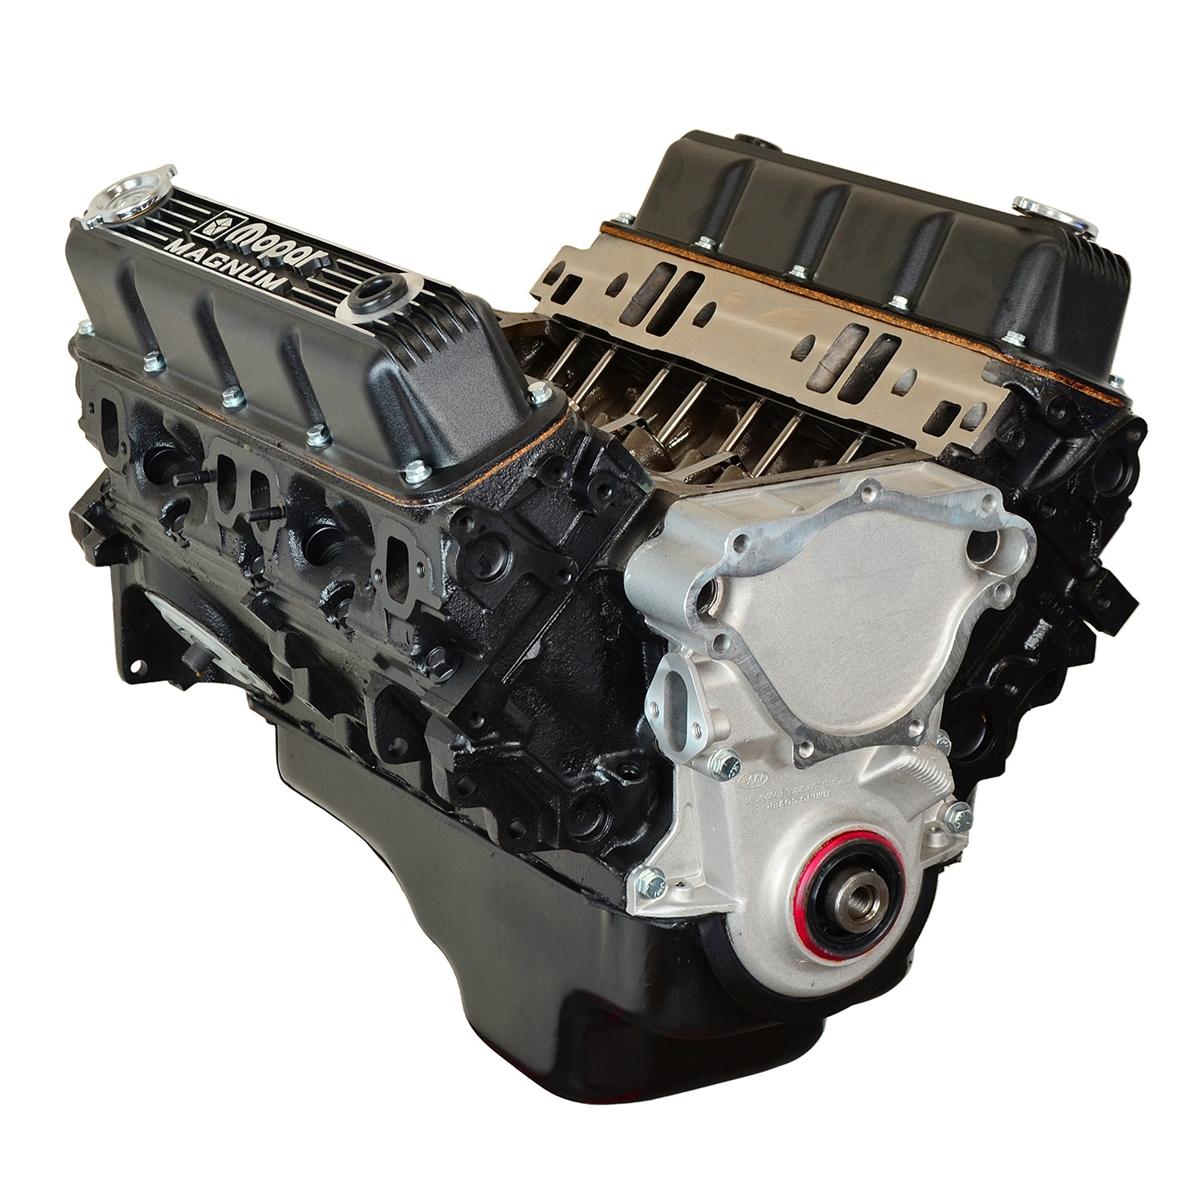 ATK HP73 Chrysler 360 Magnum Engine 320HP